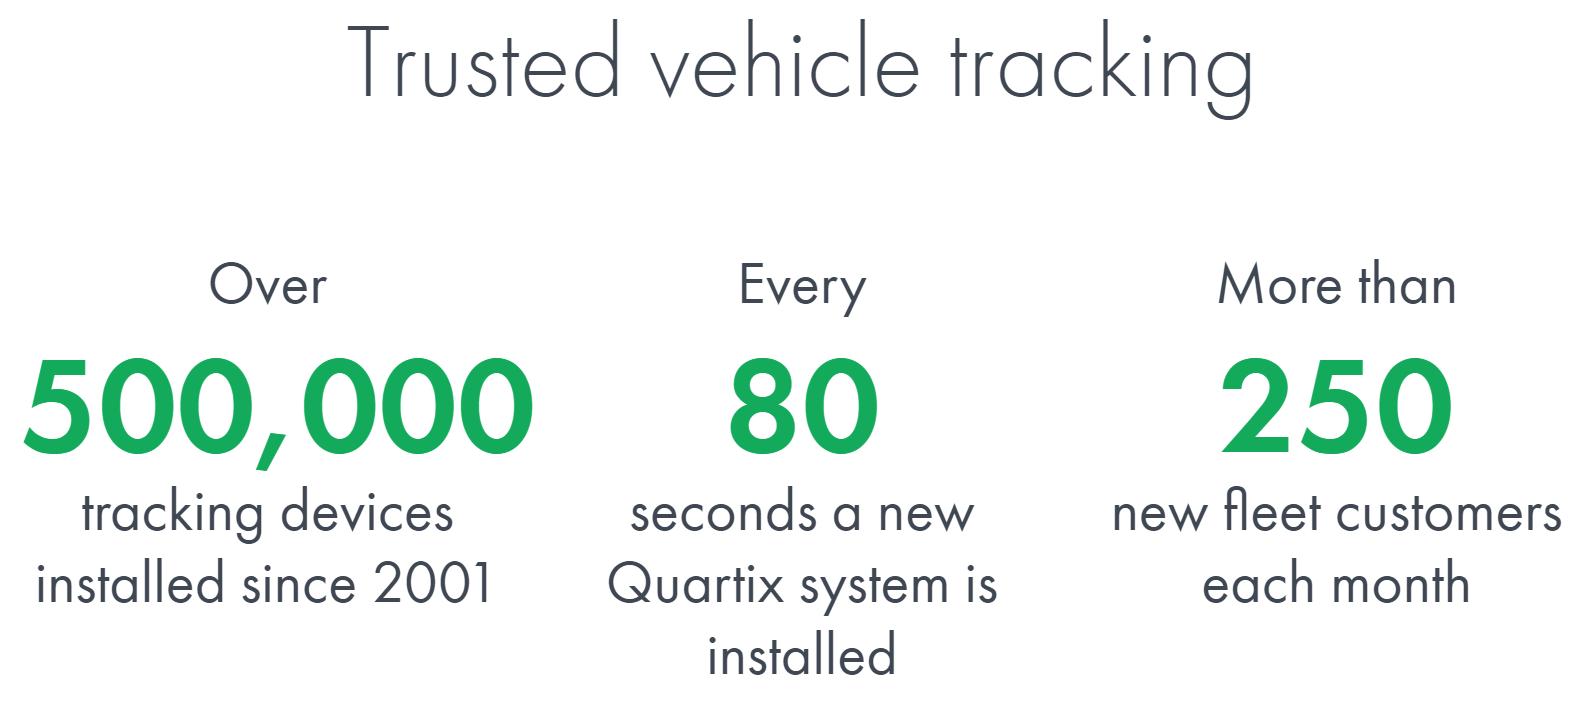 richard_beddard_sharepad_quartix_vehicle_tracking